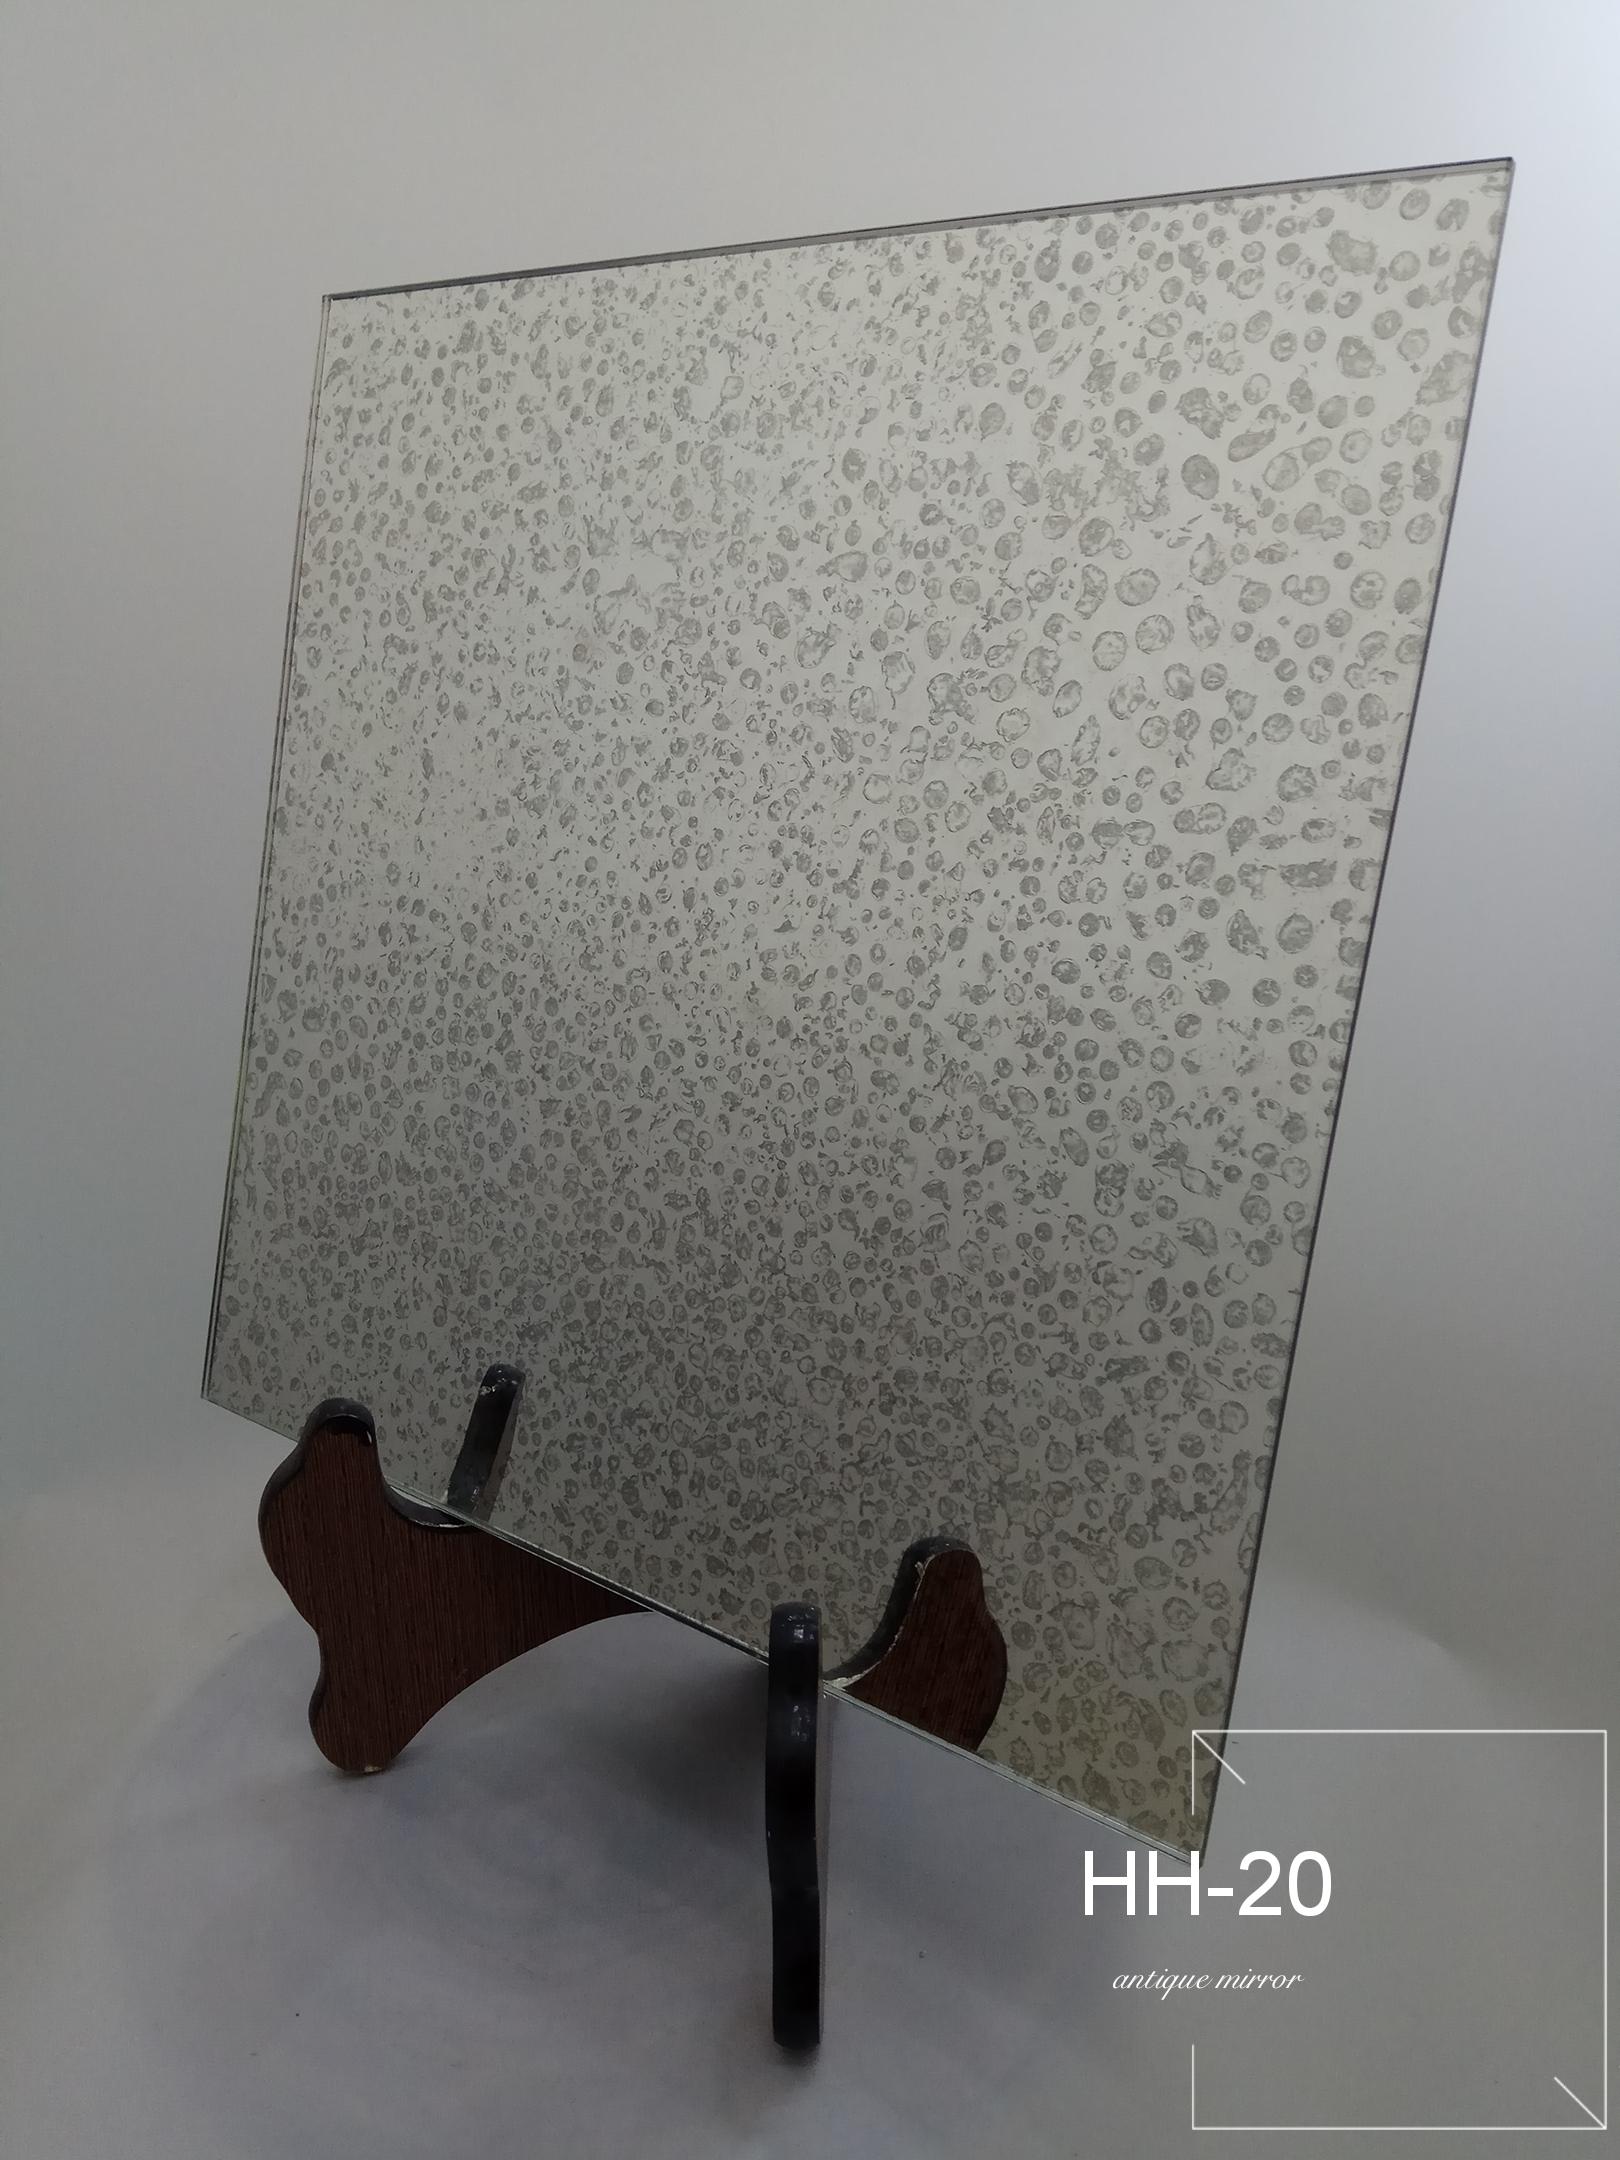 HH-20 Antique Mirror/ Decorative Mirro